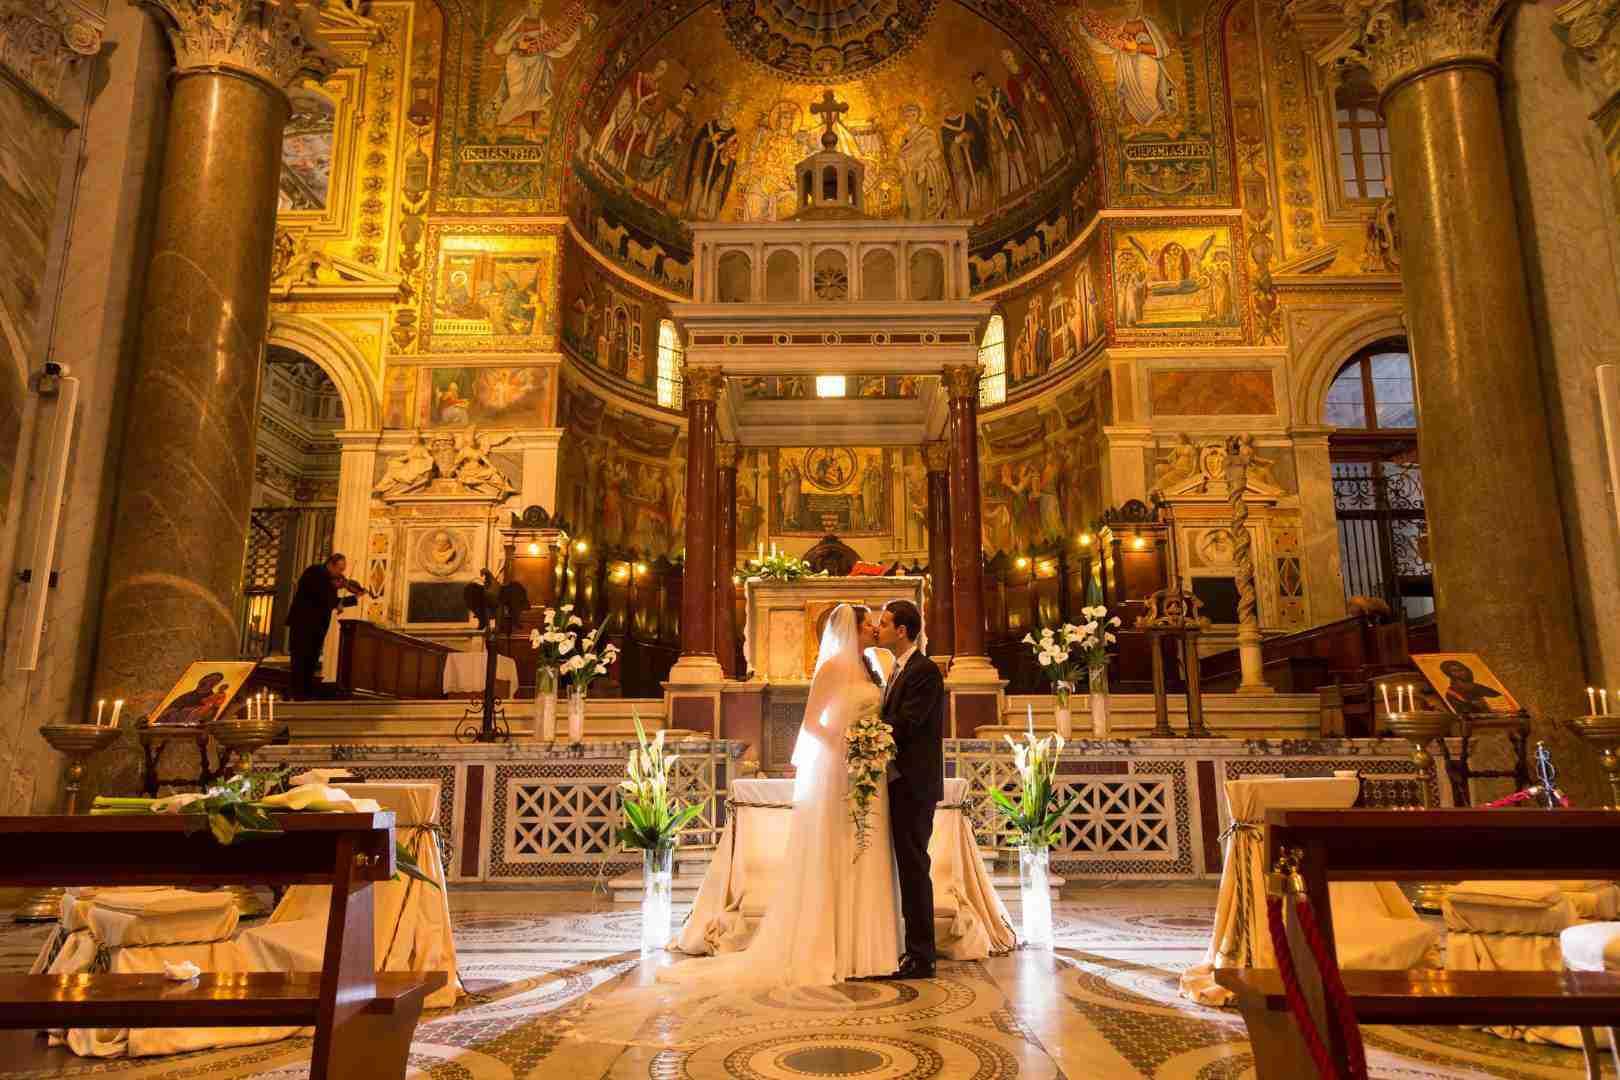 Santa Maria in Trastevere - Studio Fotografico Colizzi Roma